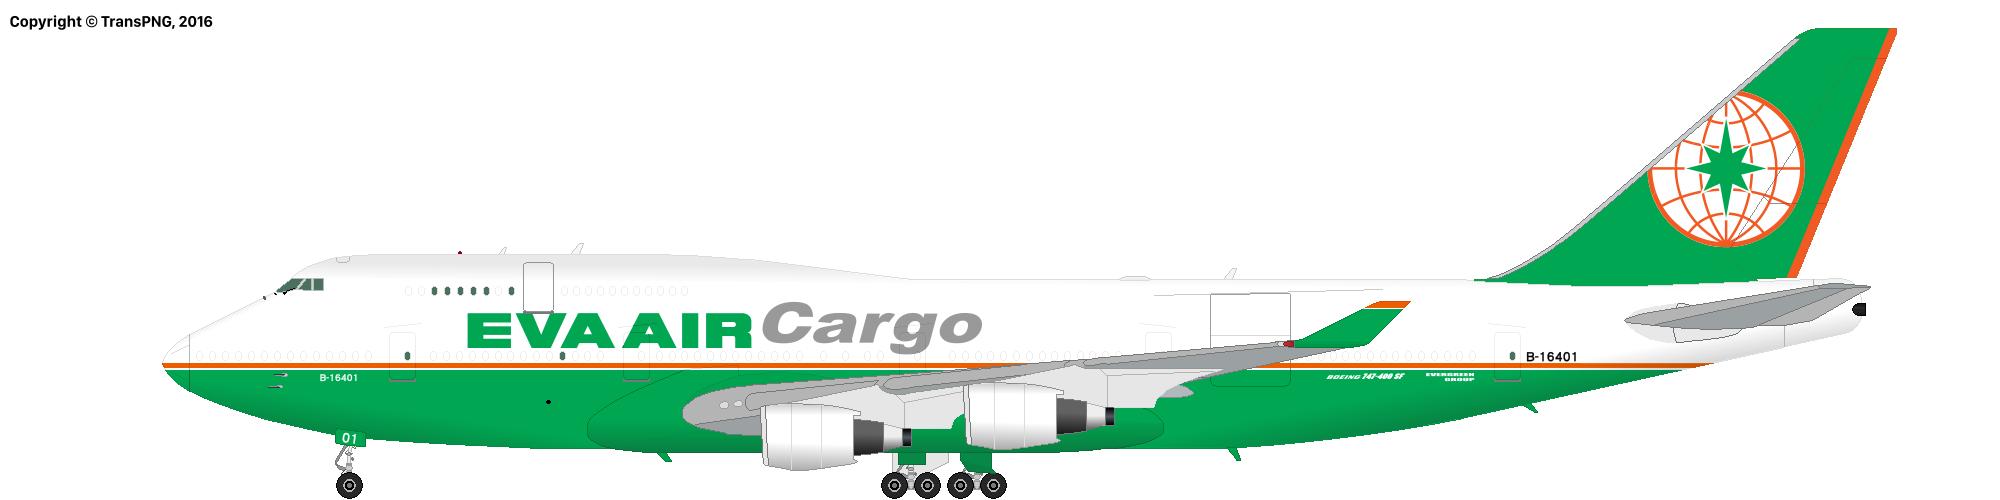 Airplane 6206